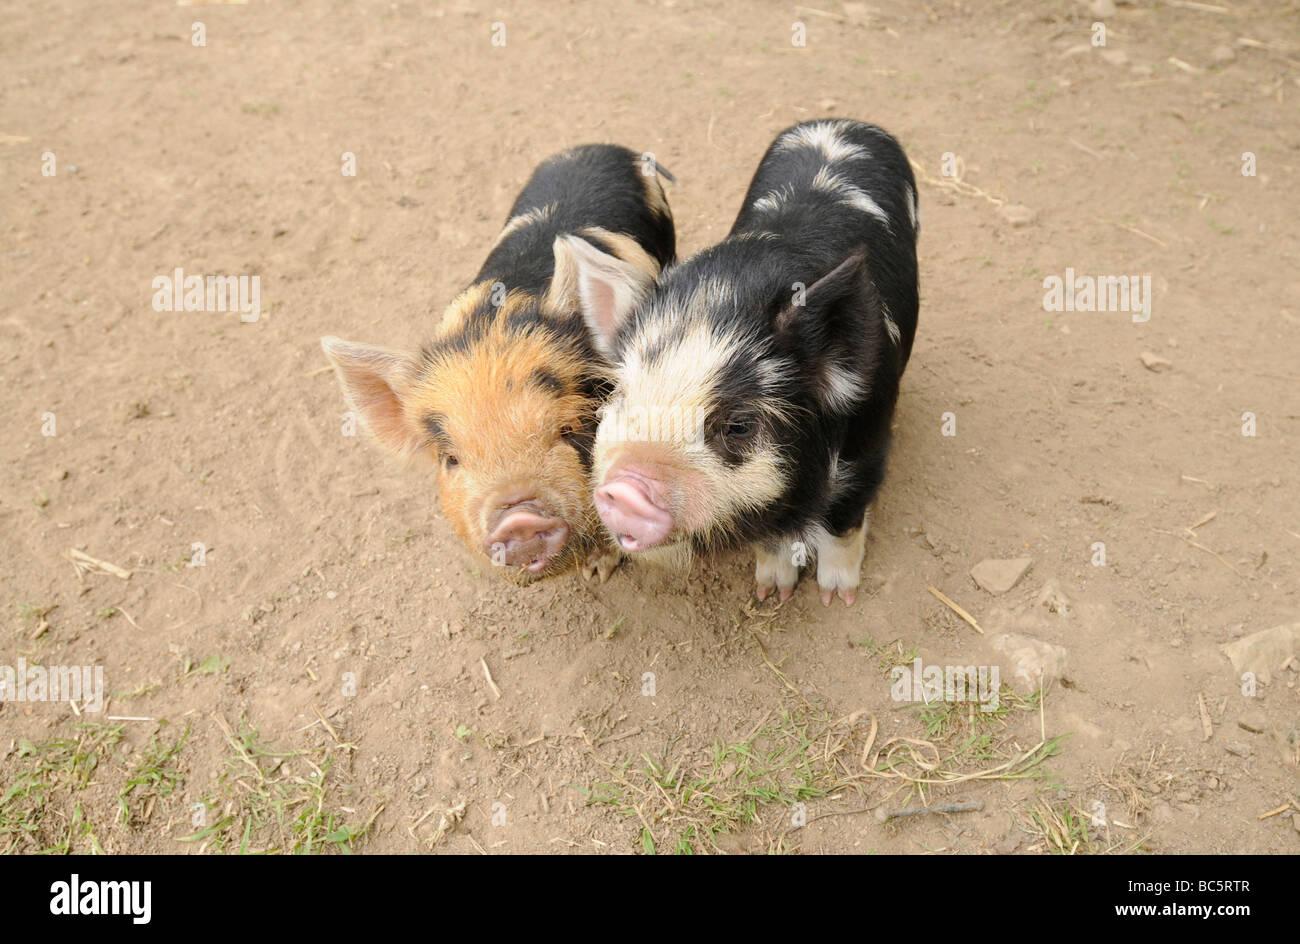 Kune Kune piglets on a Cornish farm - Stock Image